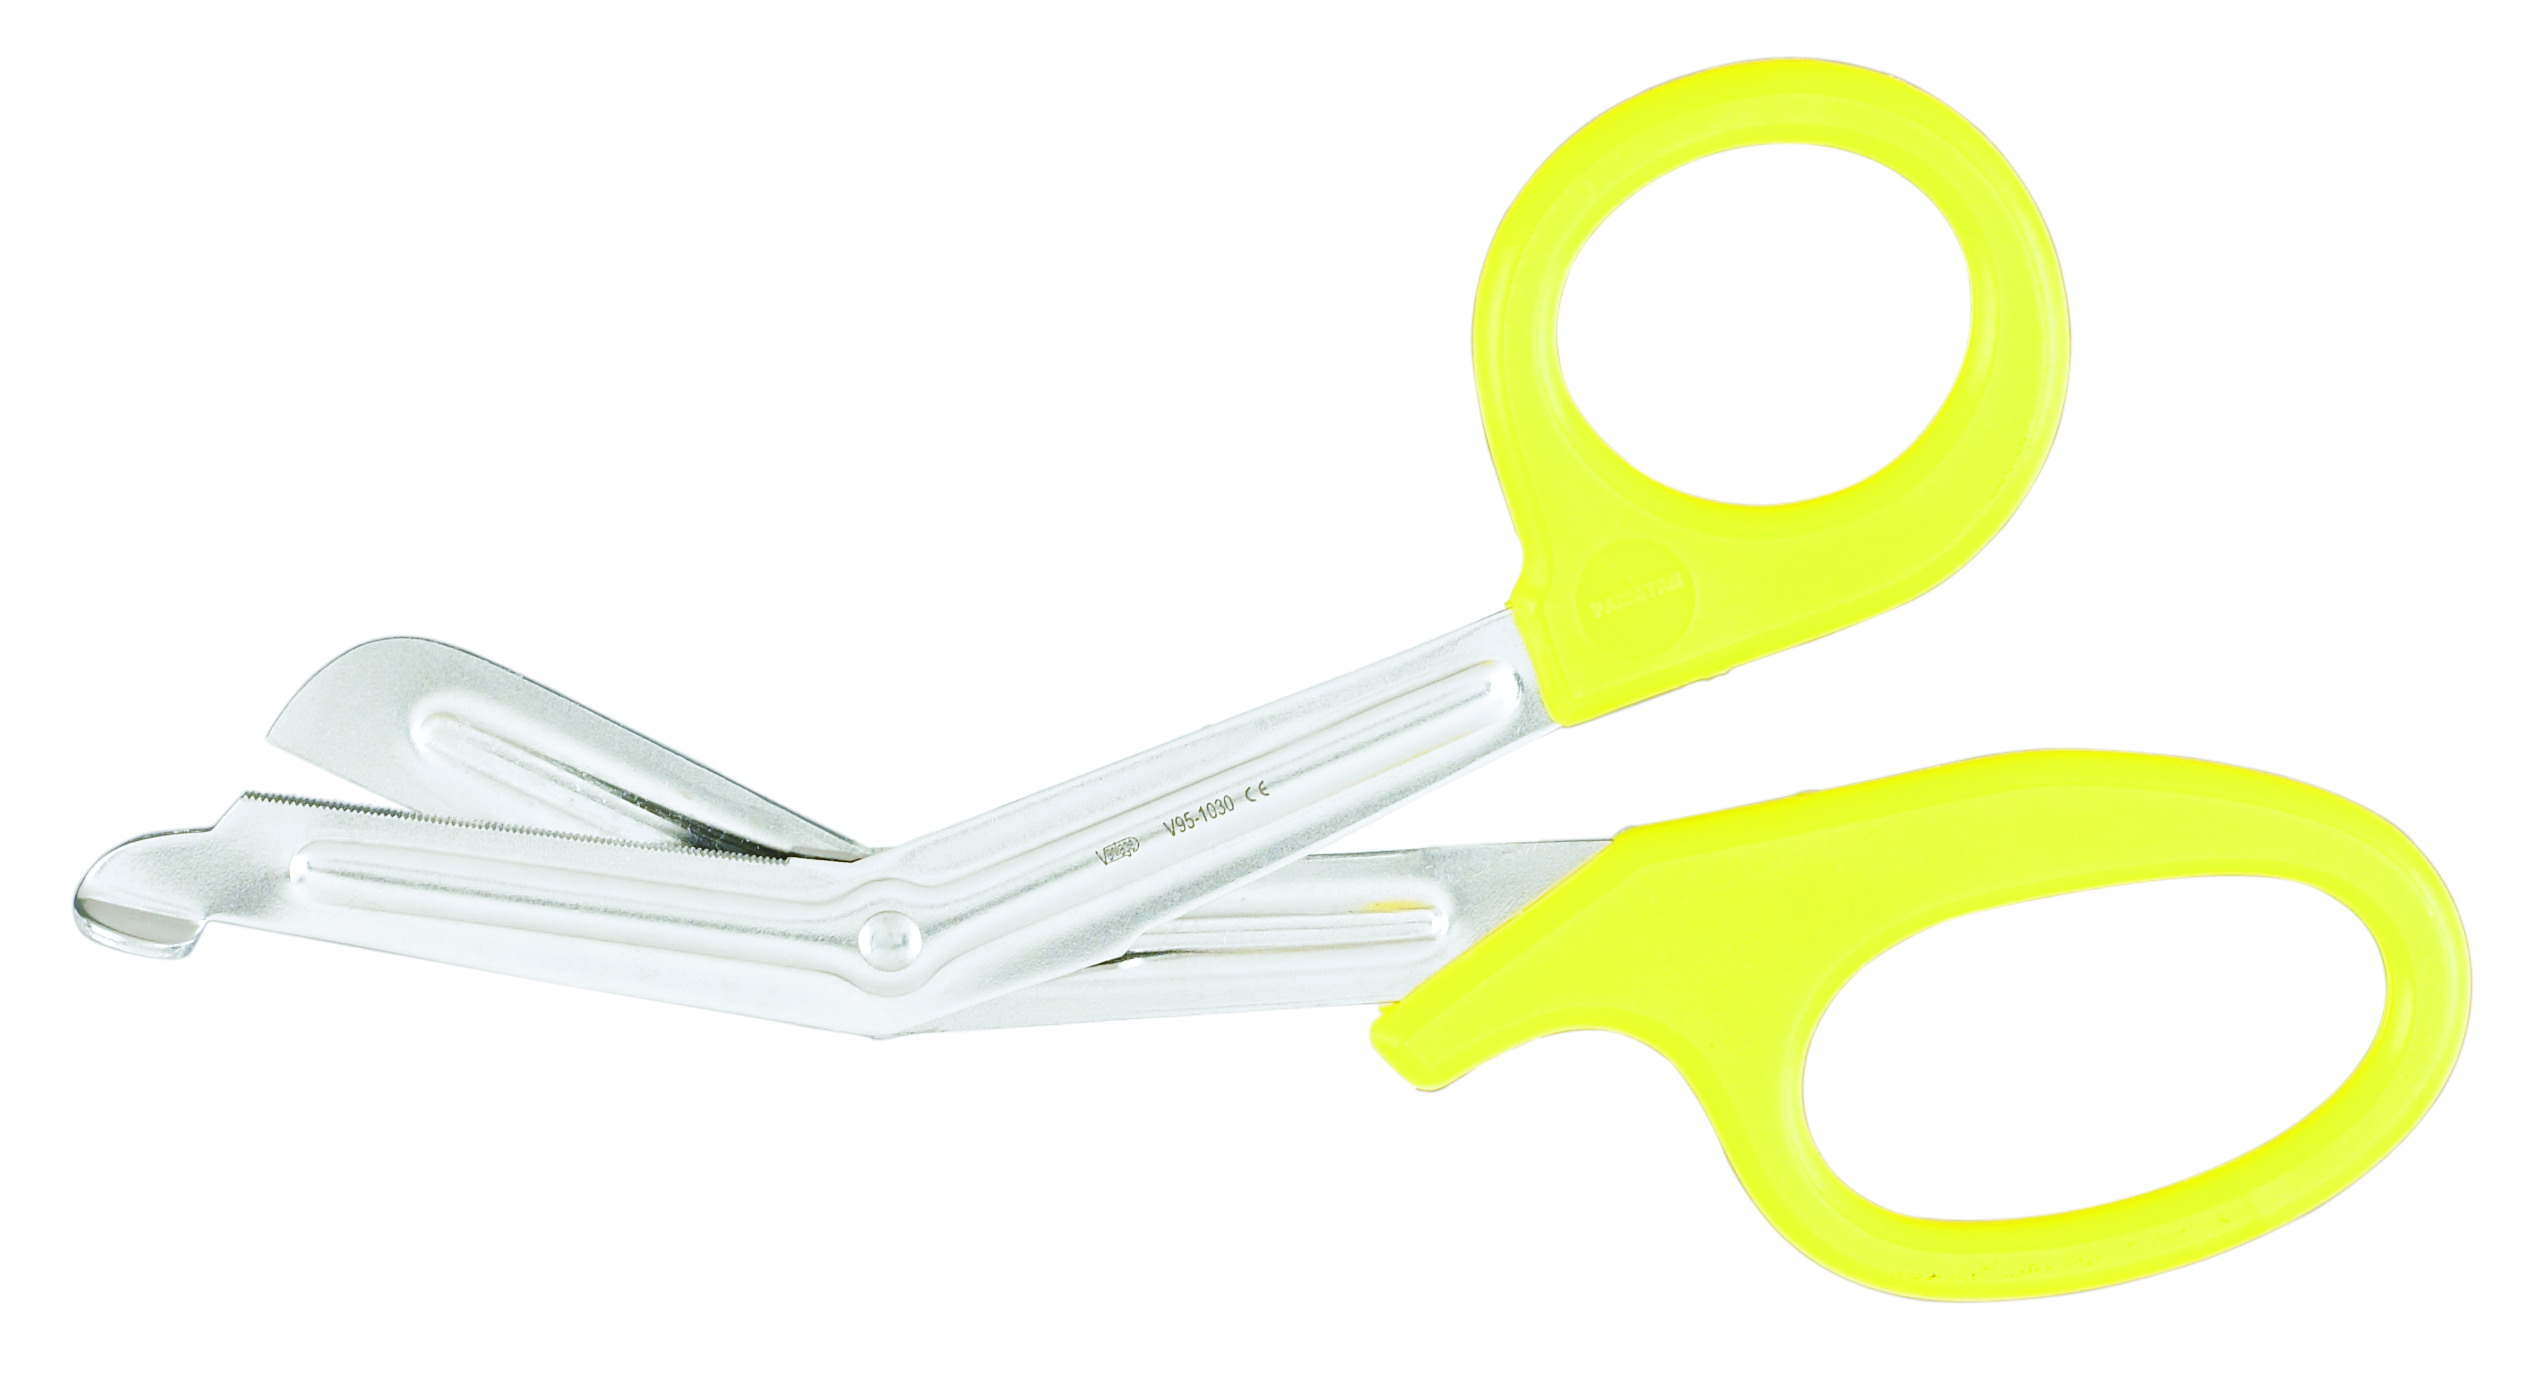 7-1-2-vantage-universal-scissors-yellow-handle-v95-1030-miltex.jpg